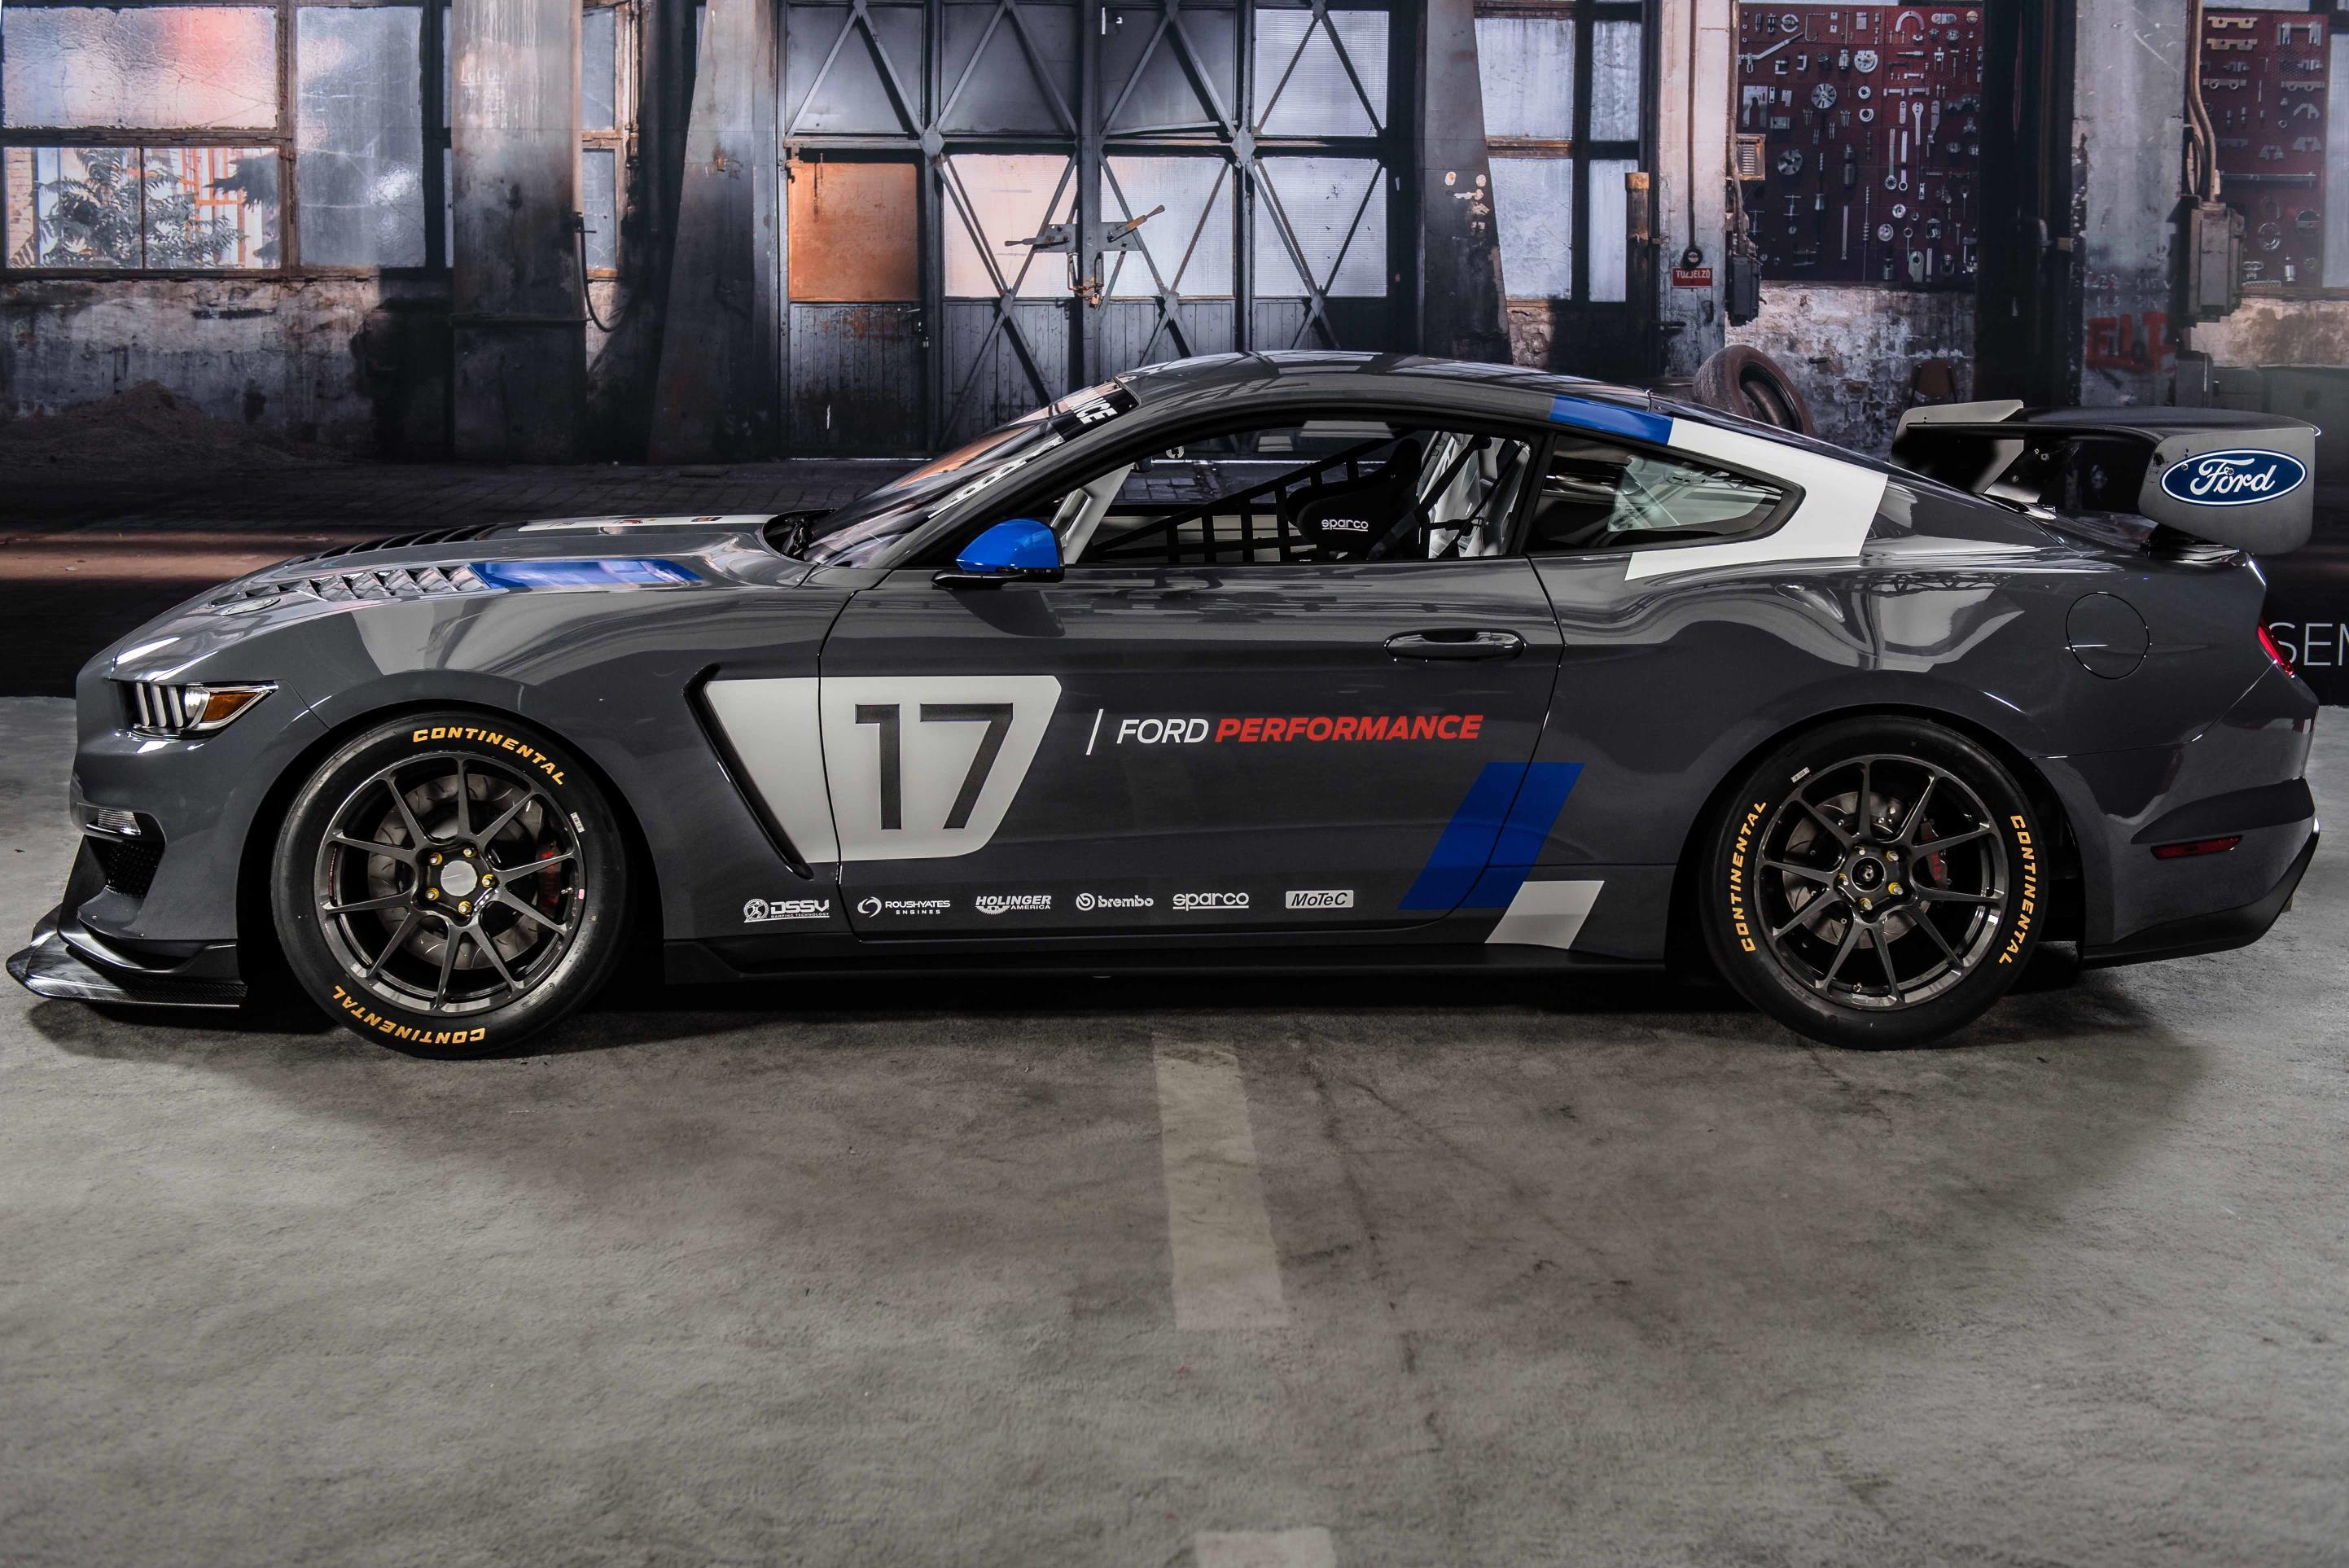 2017 Ford Mustang GT4 Turnkey Racecar Has Cross-Plane ...